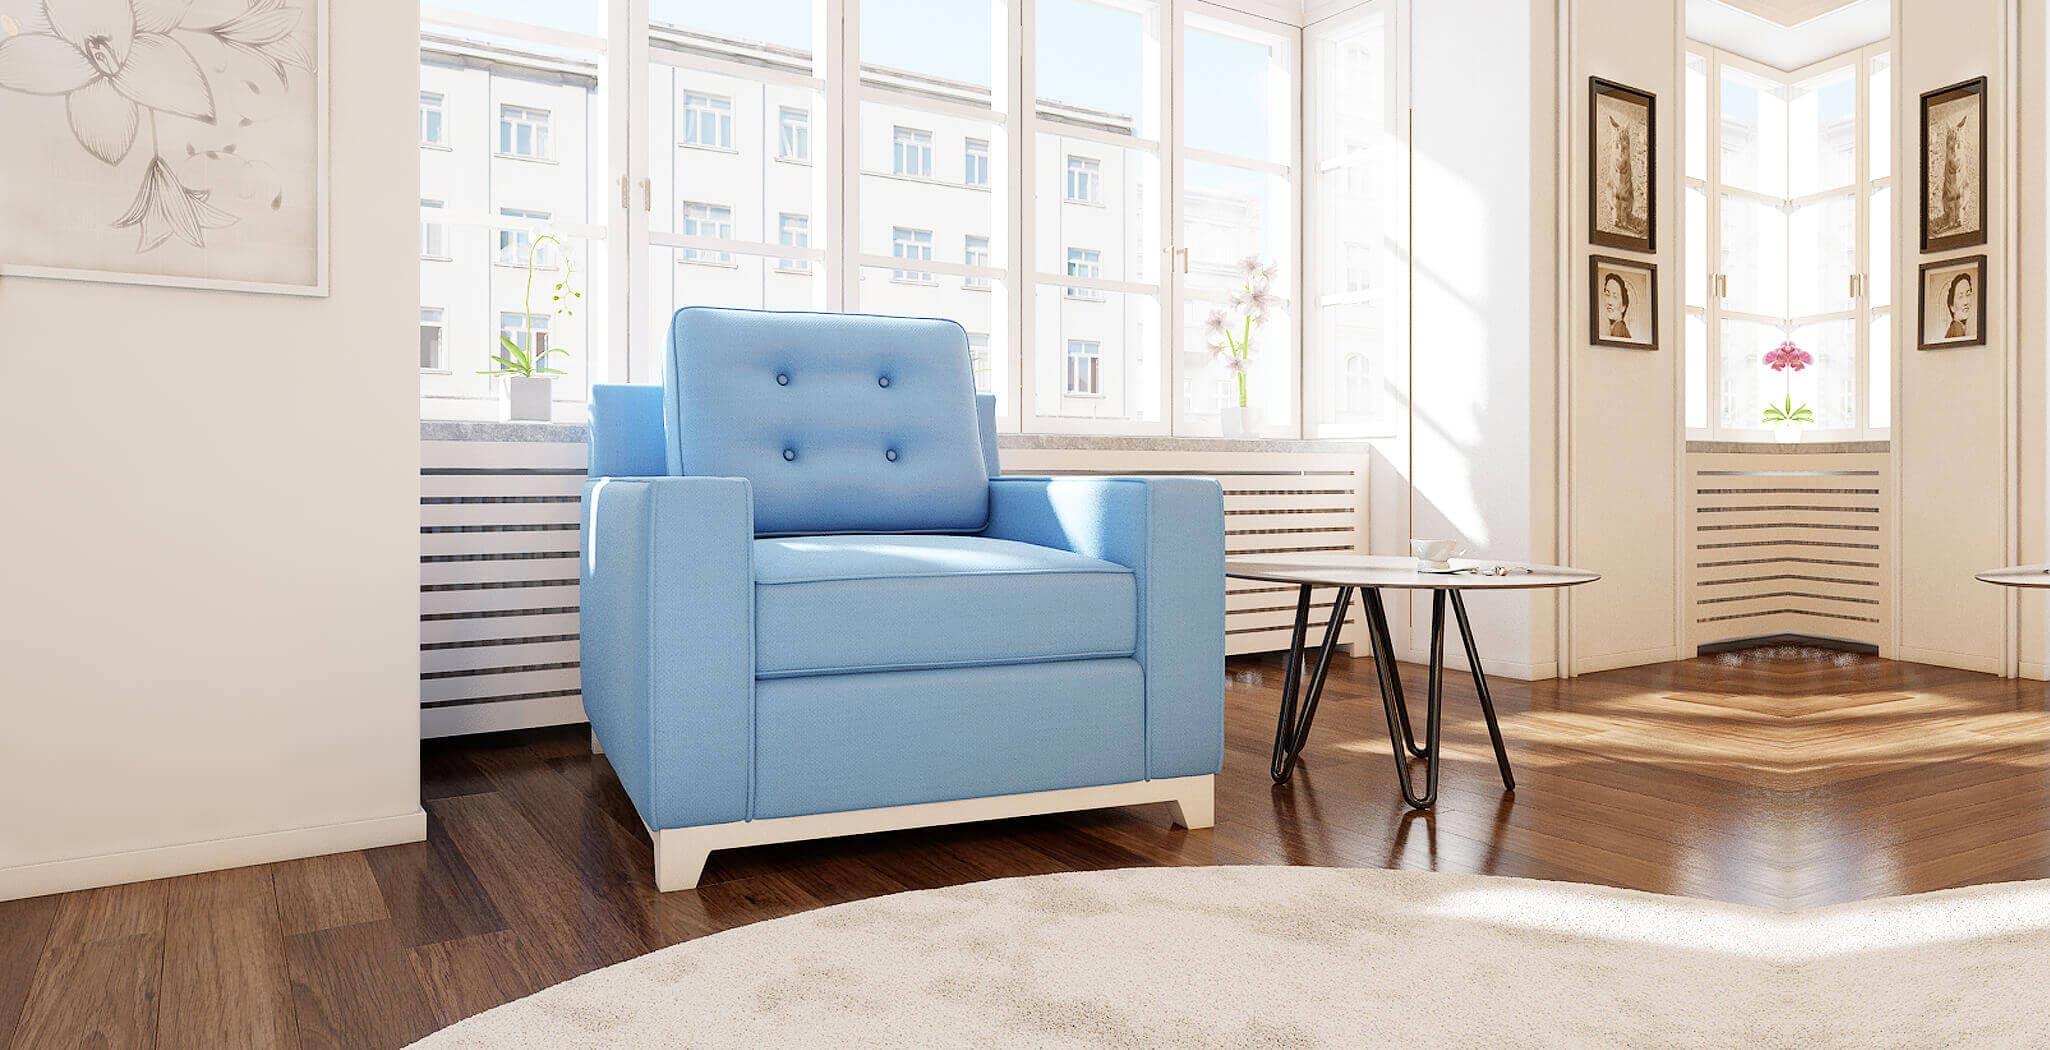 alexandria chair furniture gallery 3